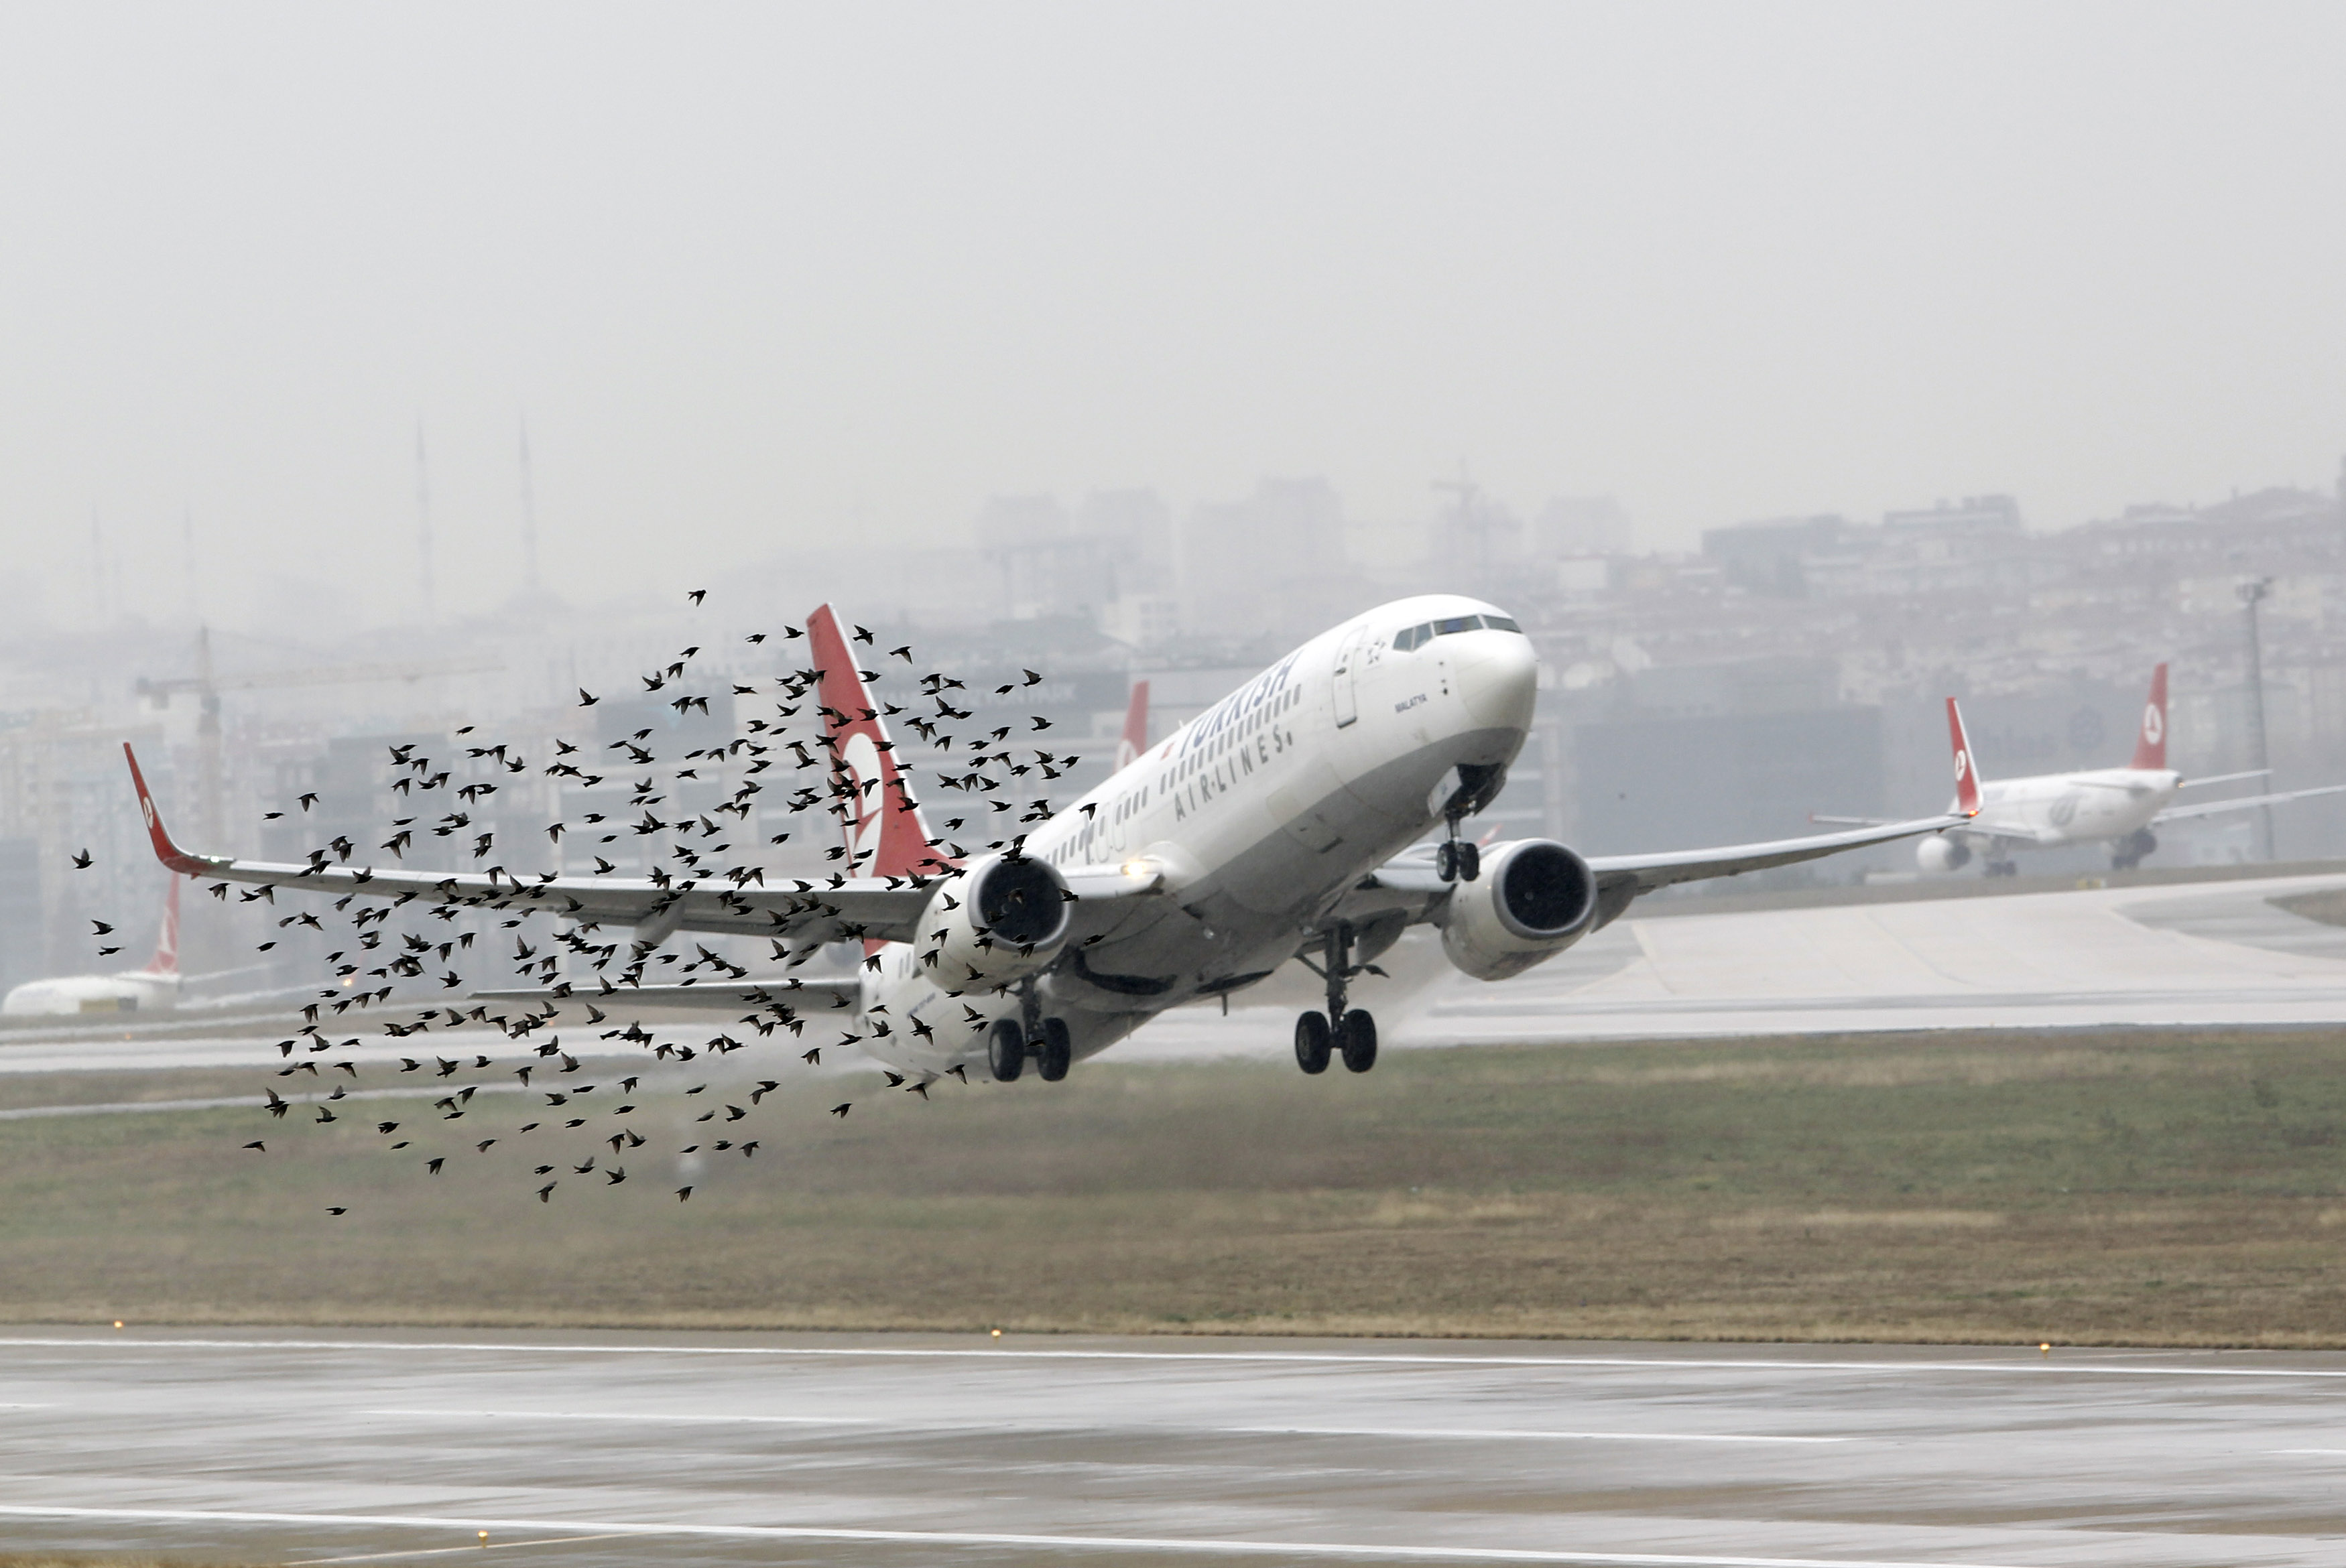 plaga de aves en aeropuertos